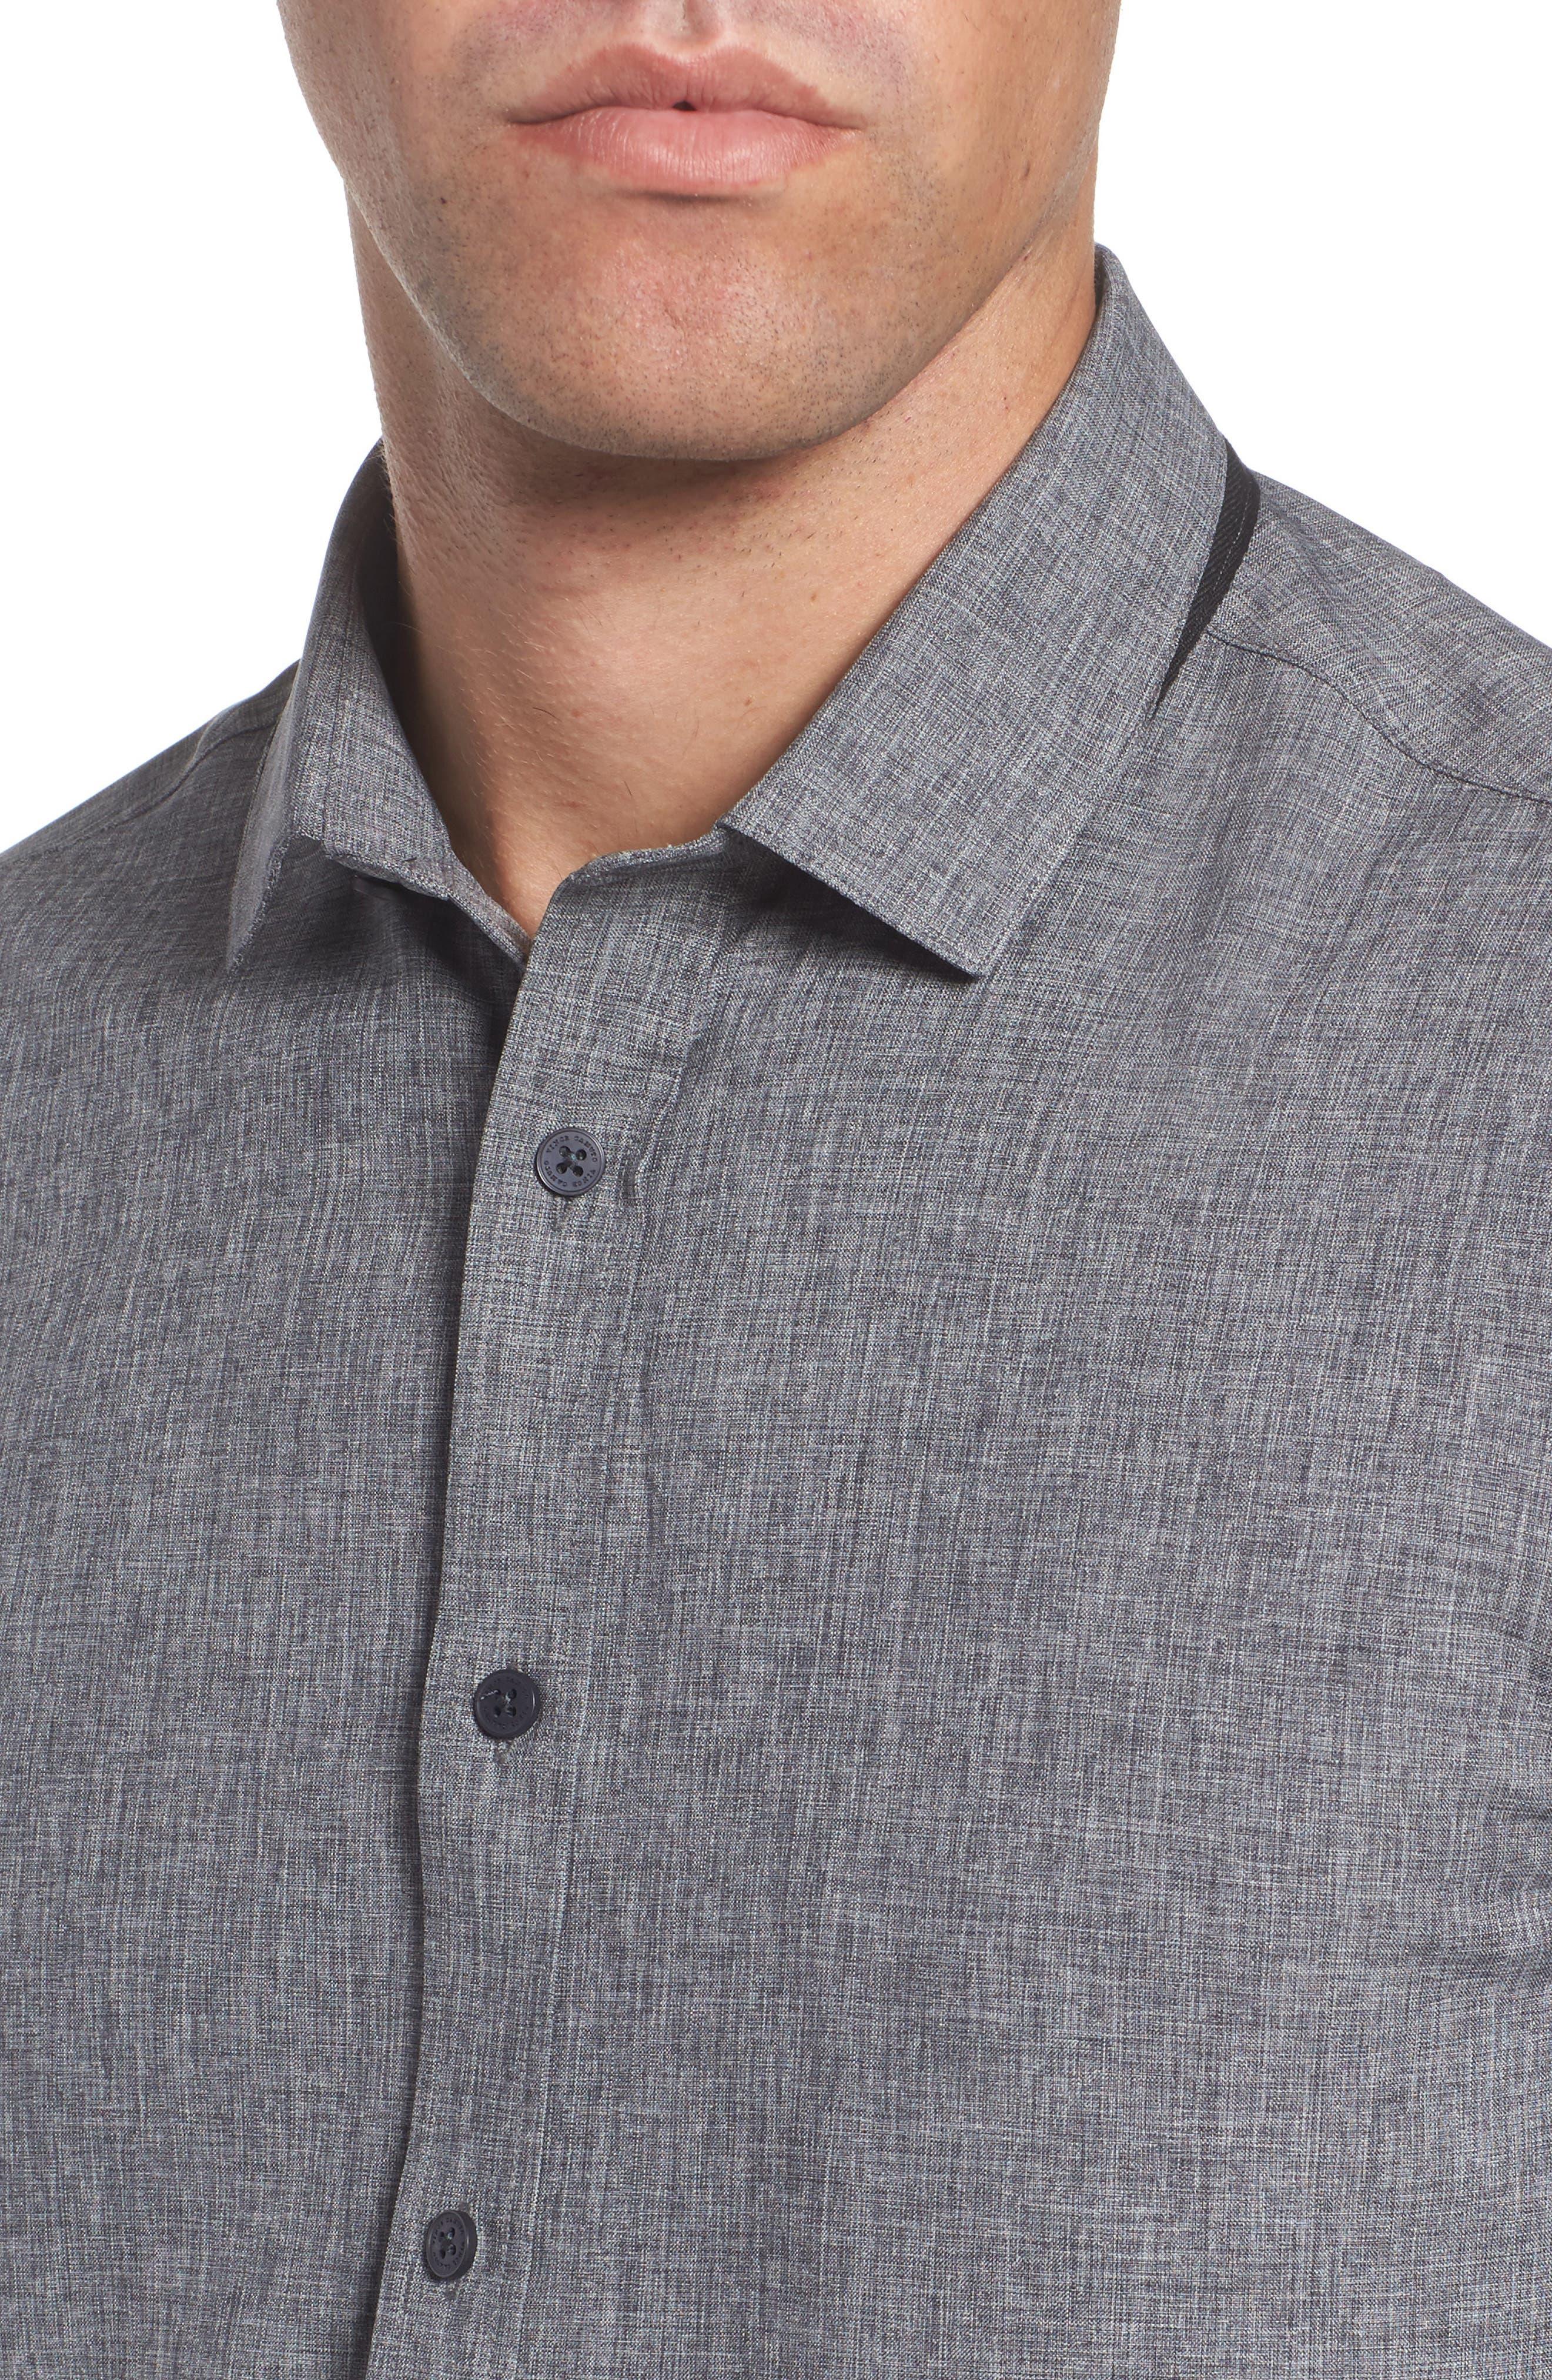 Trim Fit Performance Knit Sport Shirt,                             Alternate thumbnail 4, color,                             CHARCOAL SCRATCH